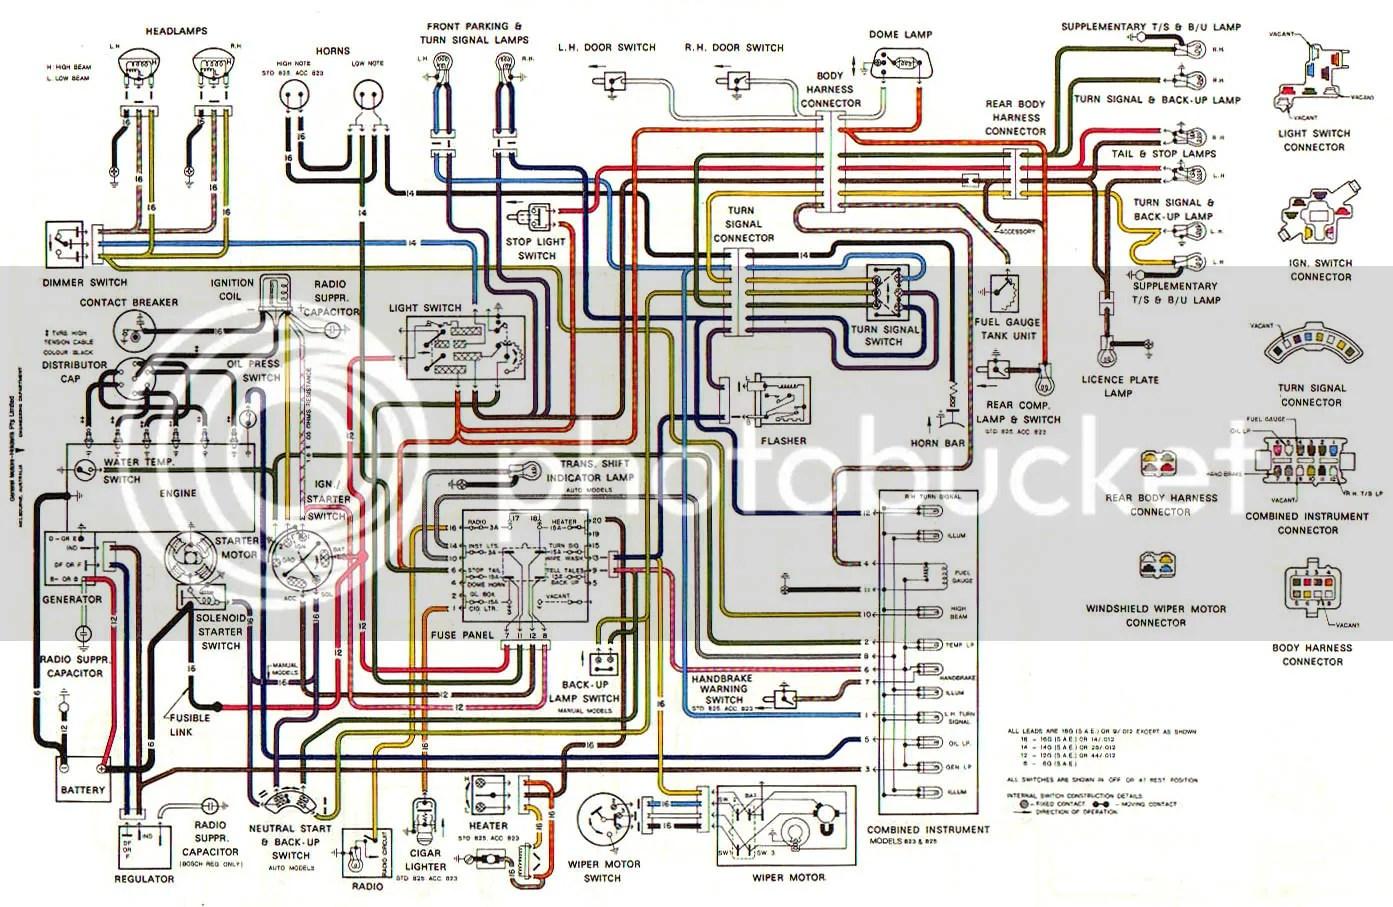 holden wb statesman wiring diagram sony xplod cdx l550x hq manual e books wiper motor g9 imixeasy de u2022hq free